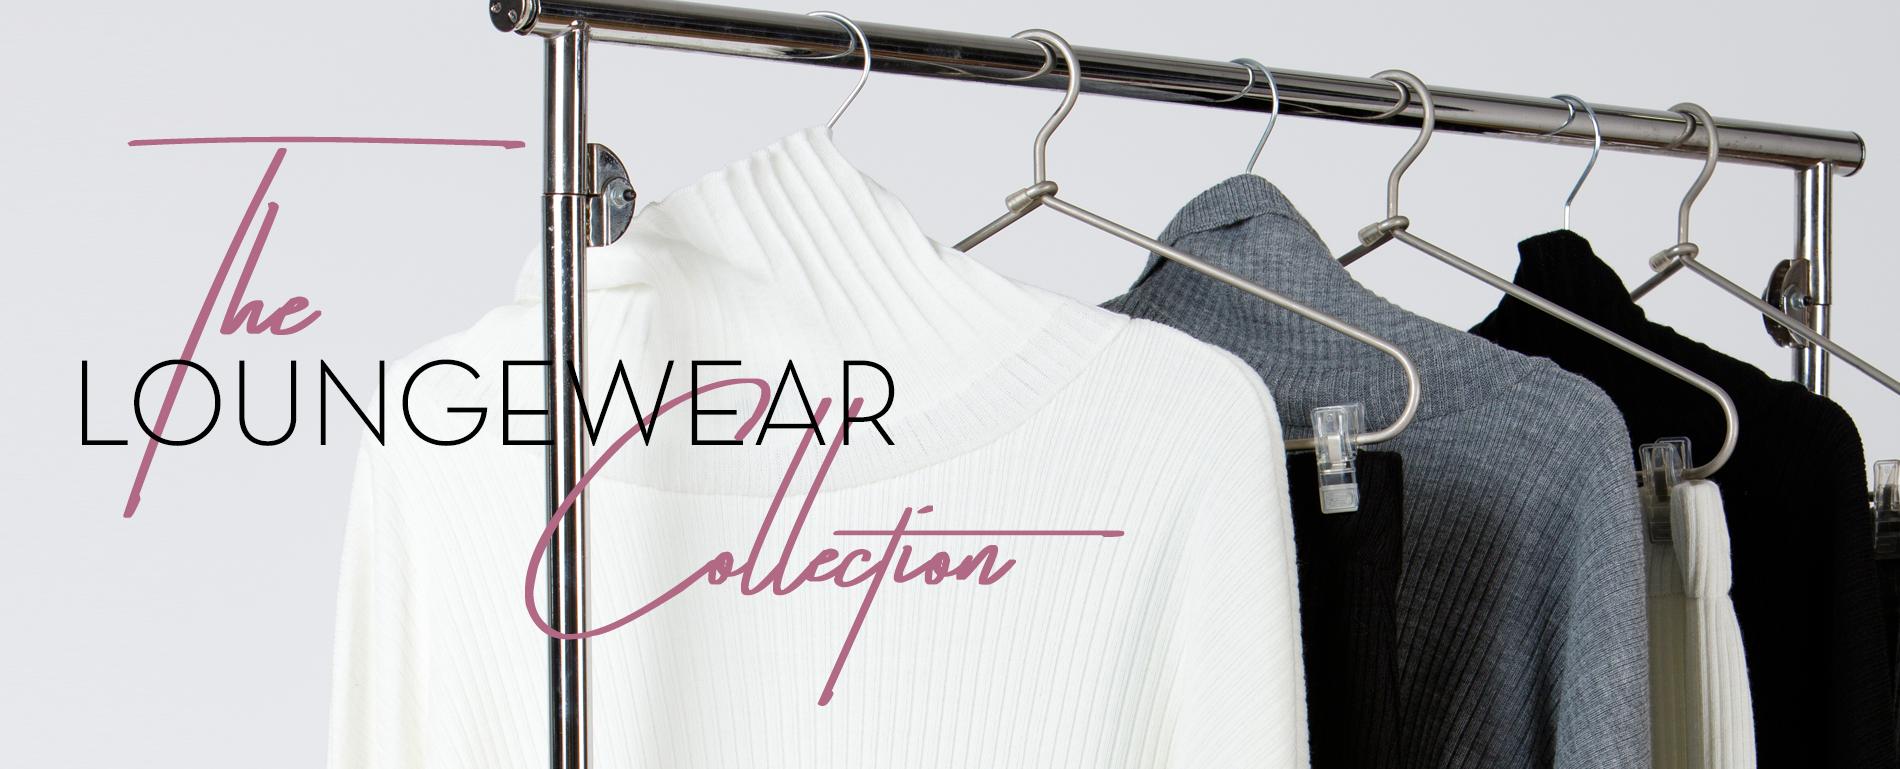 https://vivalous.com/de/landing-category/loungewear.html